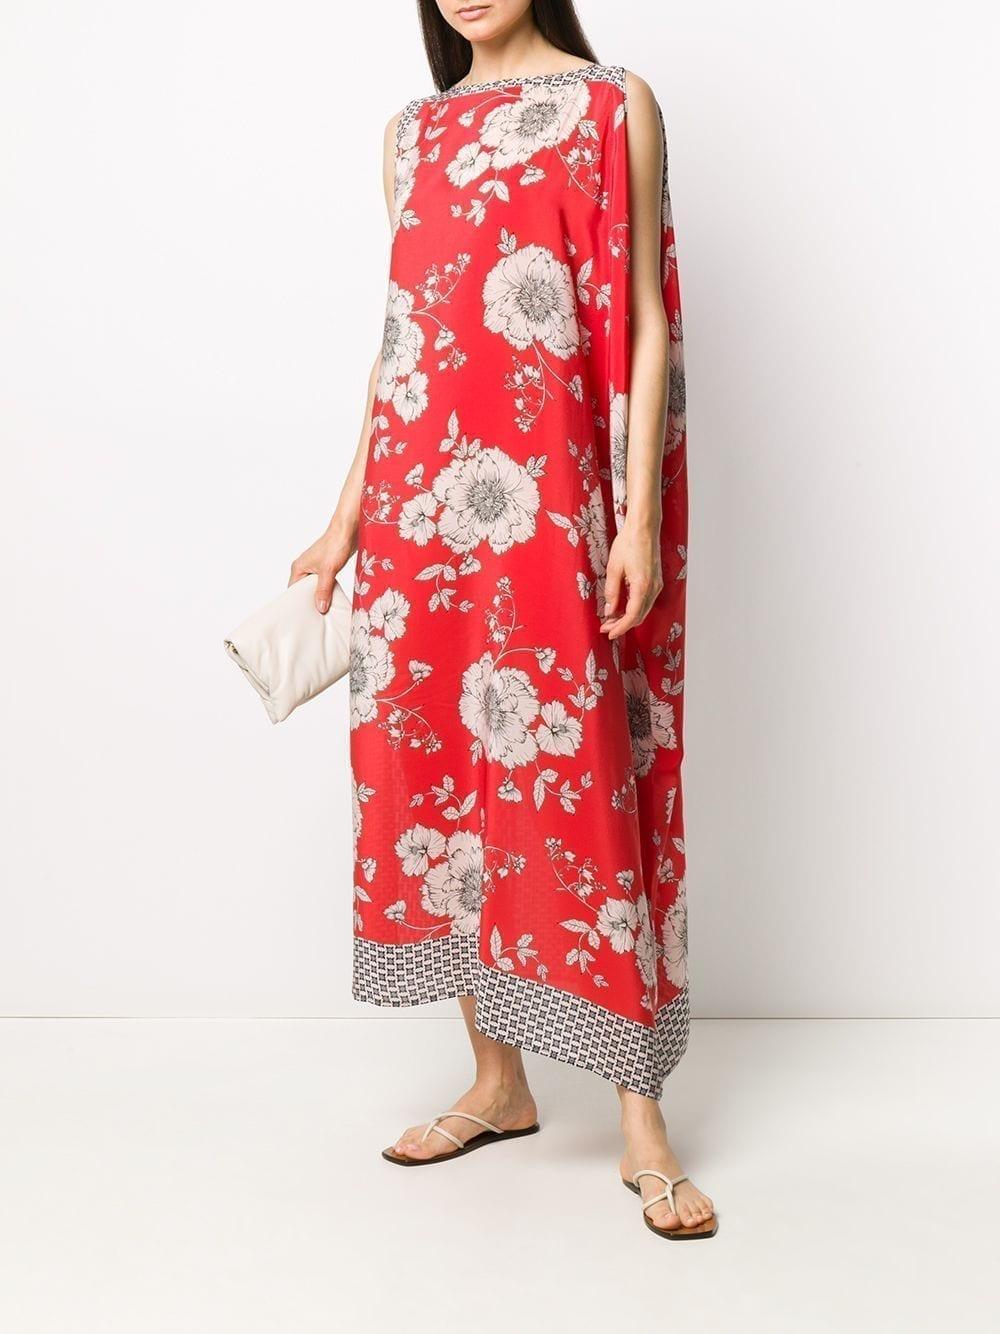 P.A.R.O.S.H. Draped Floral-print Dress